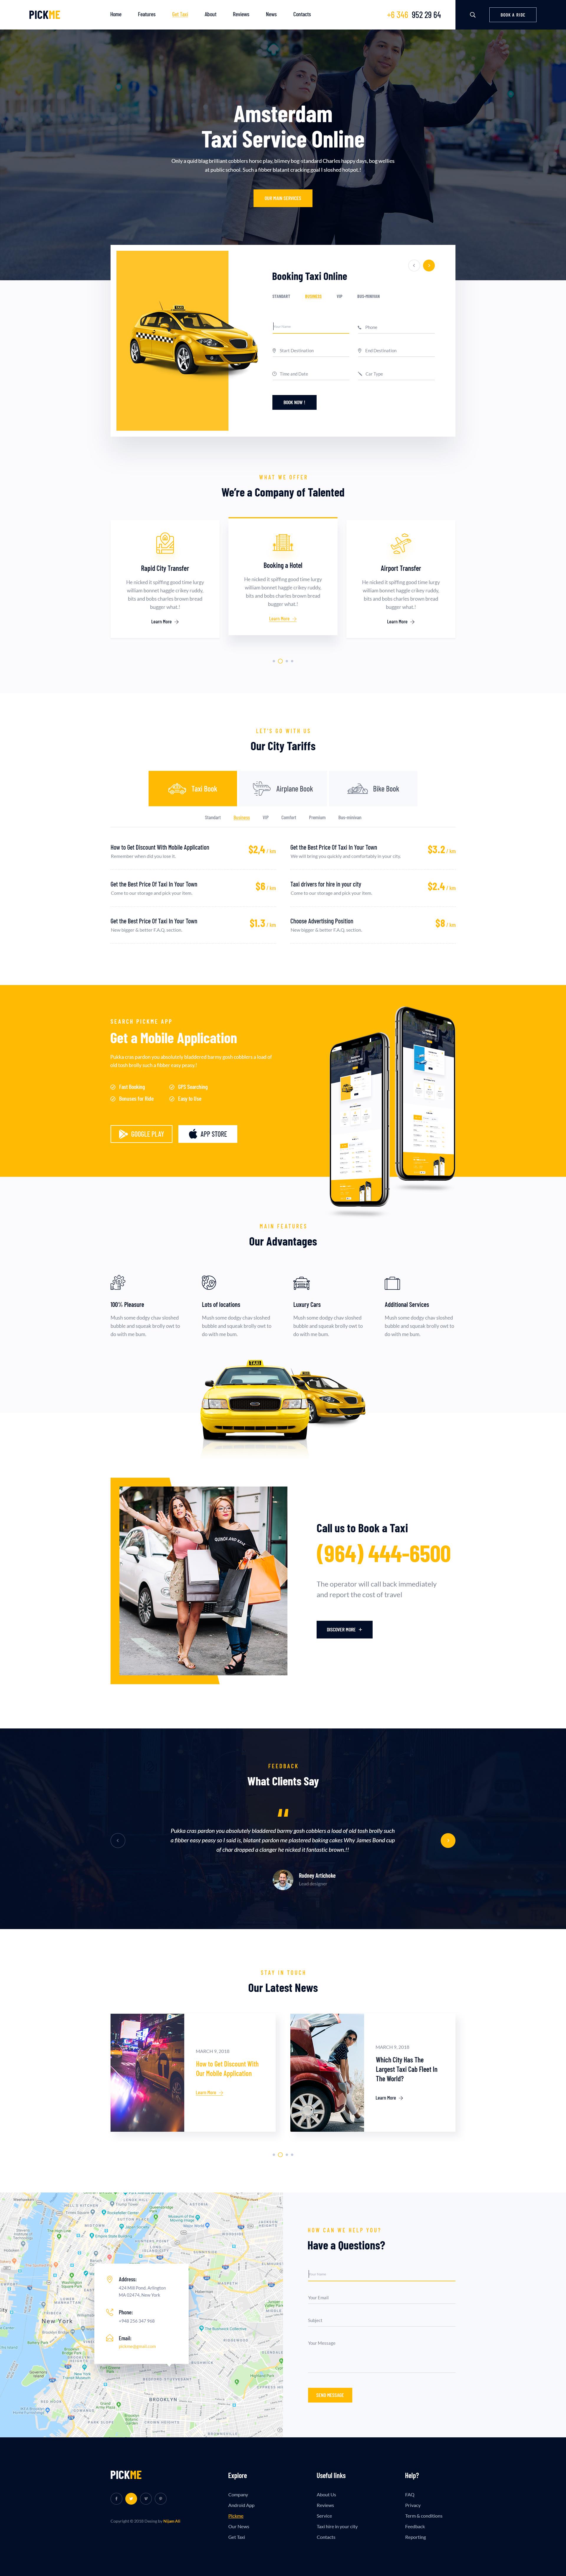 PickMe – Modern Taxi Cab Rental Service HTML Template